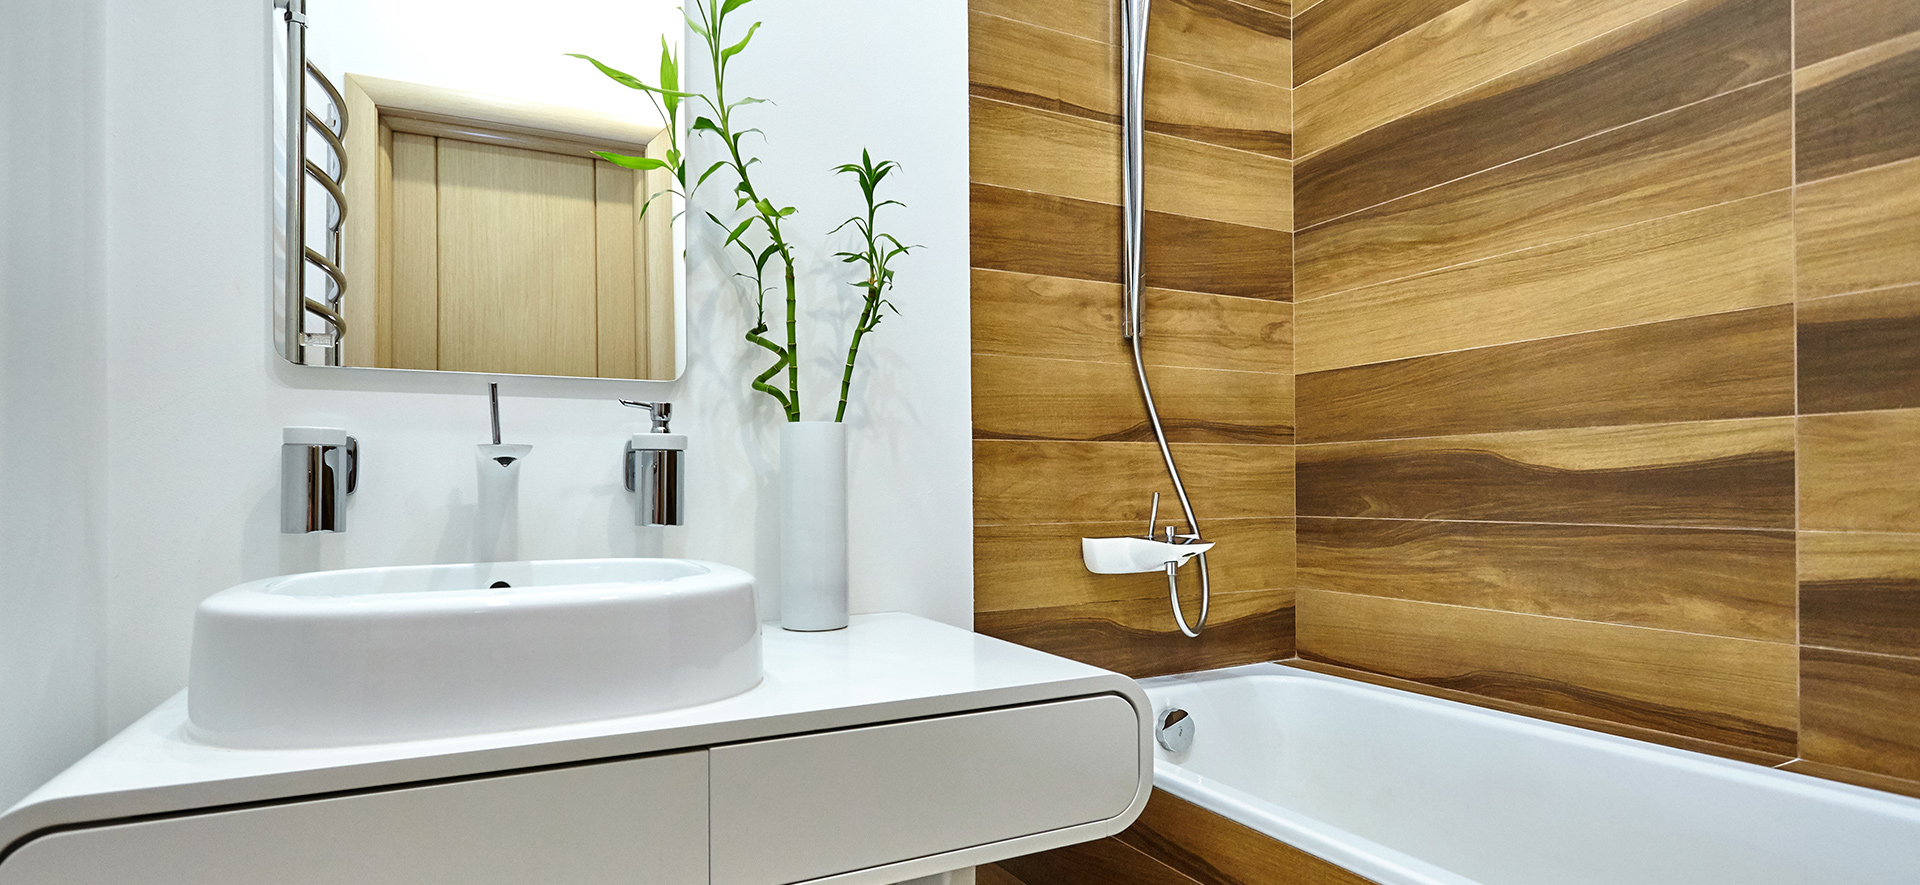 Nos salles de bains «Signature»